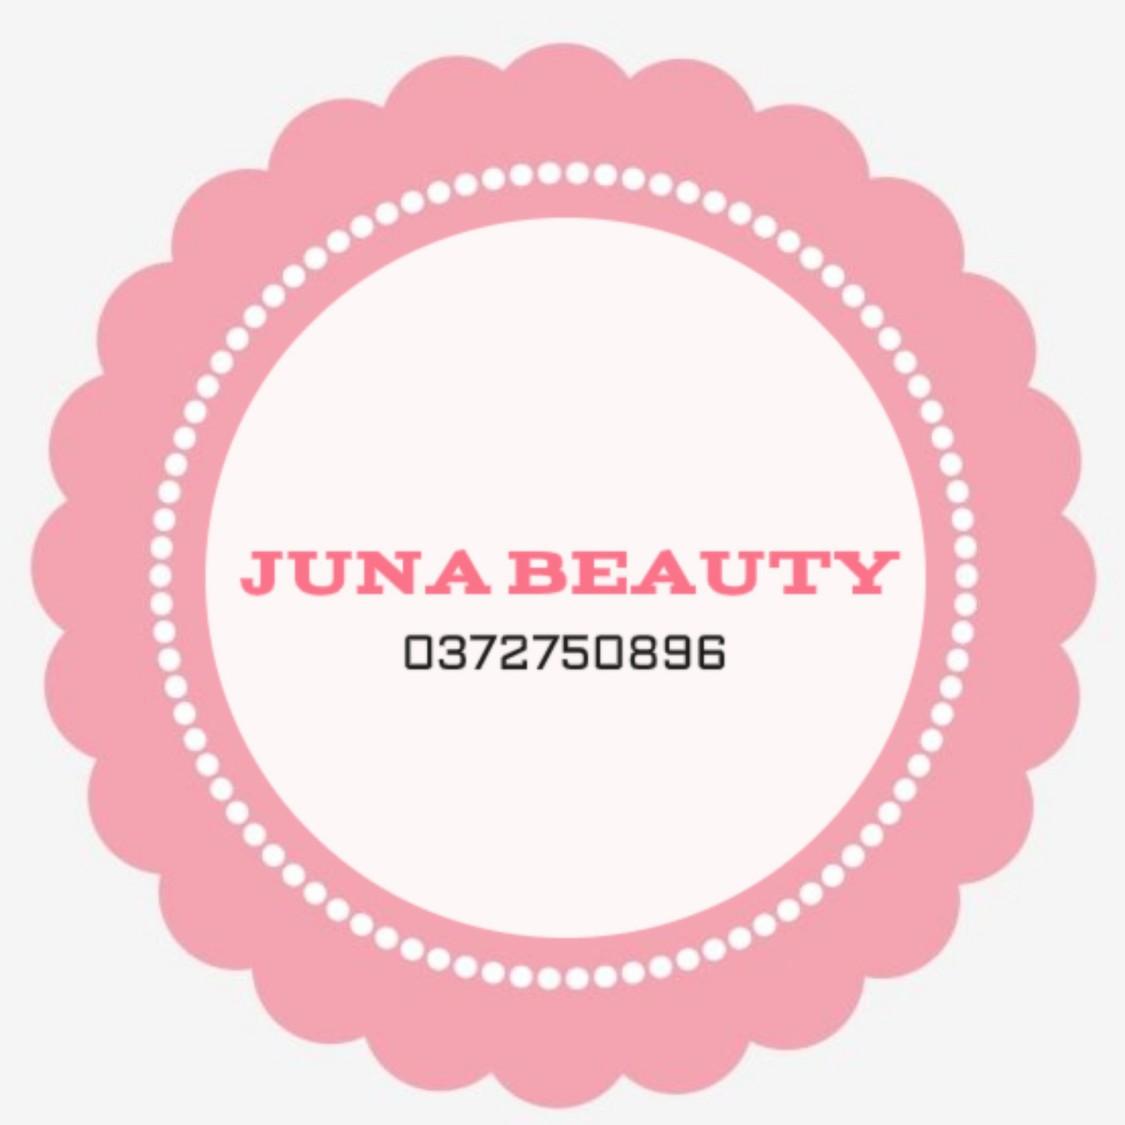 Juna Beauty